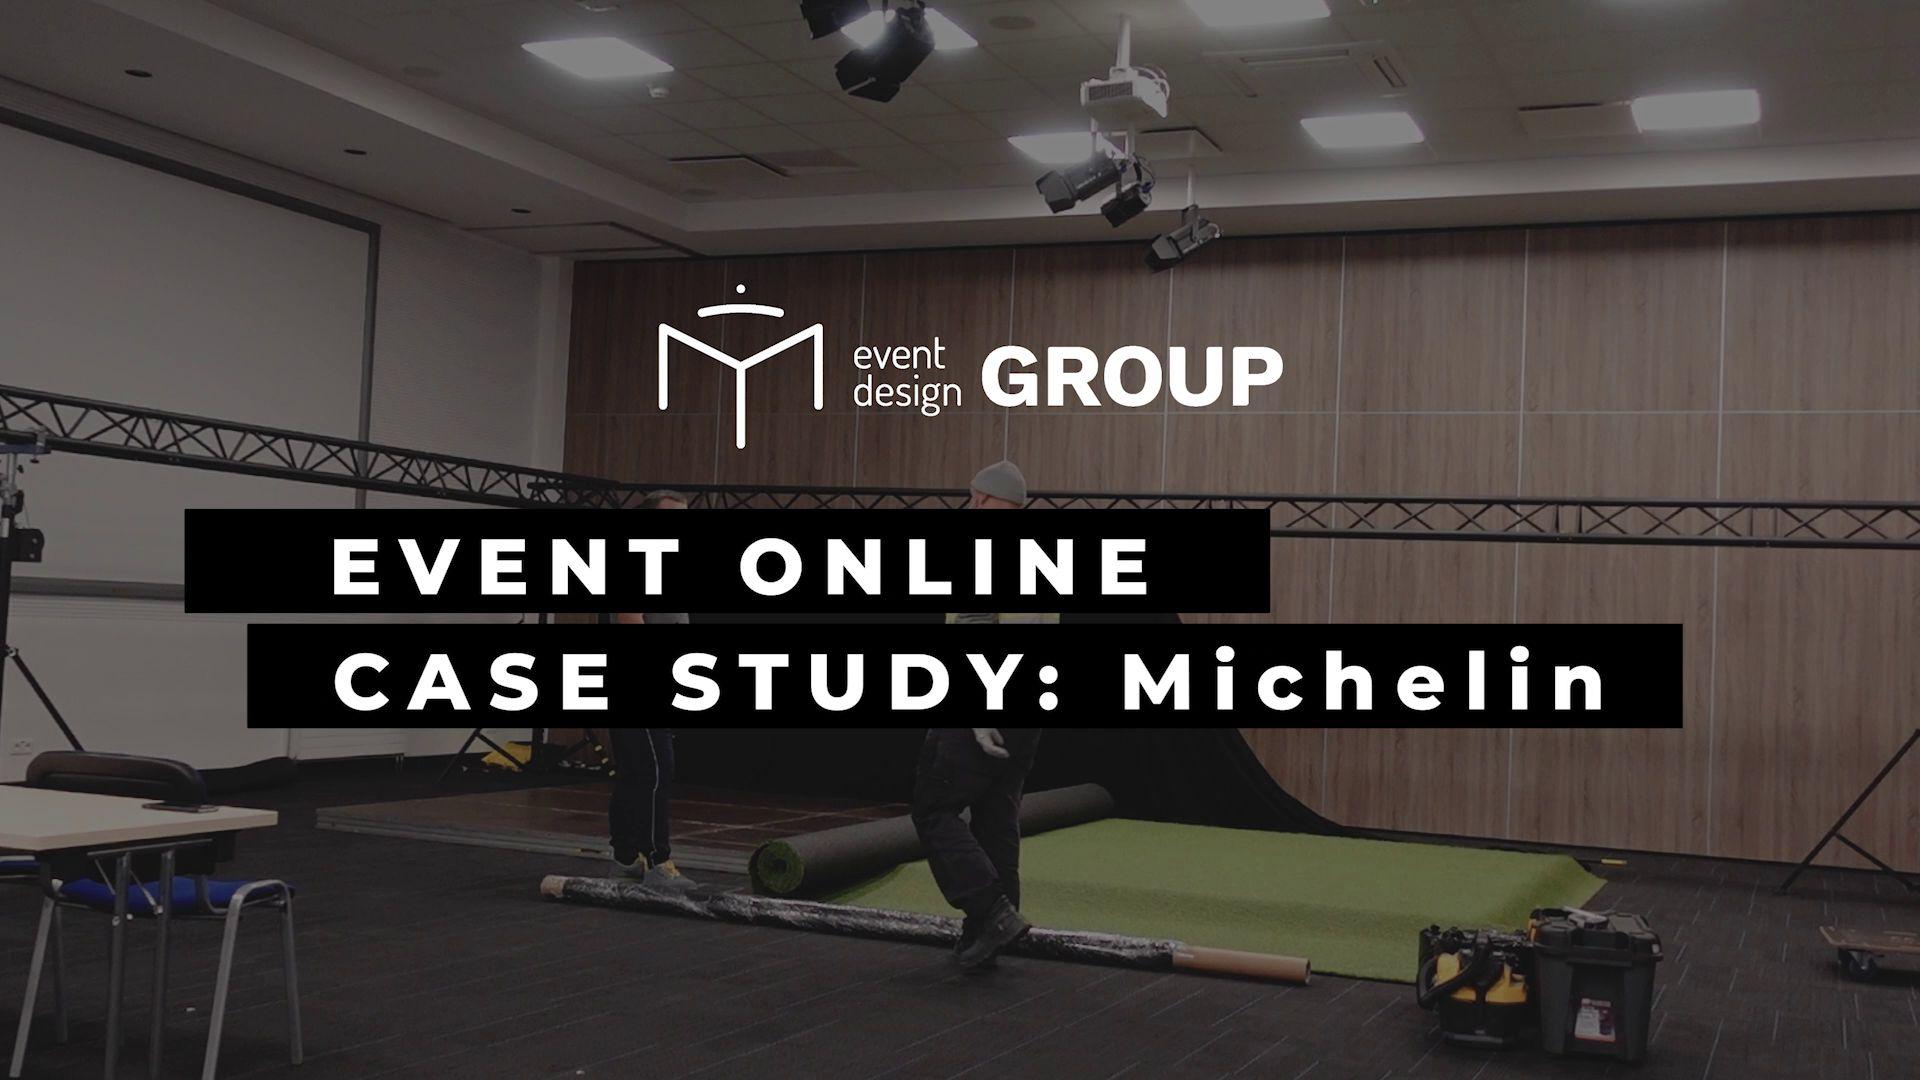 Organizacja eventu ONLINE 'Michelin. LTE Meeting 2021'